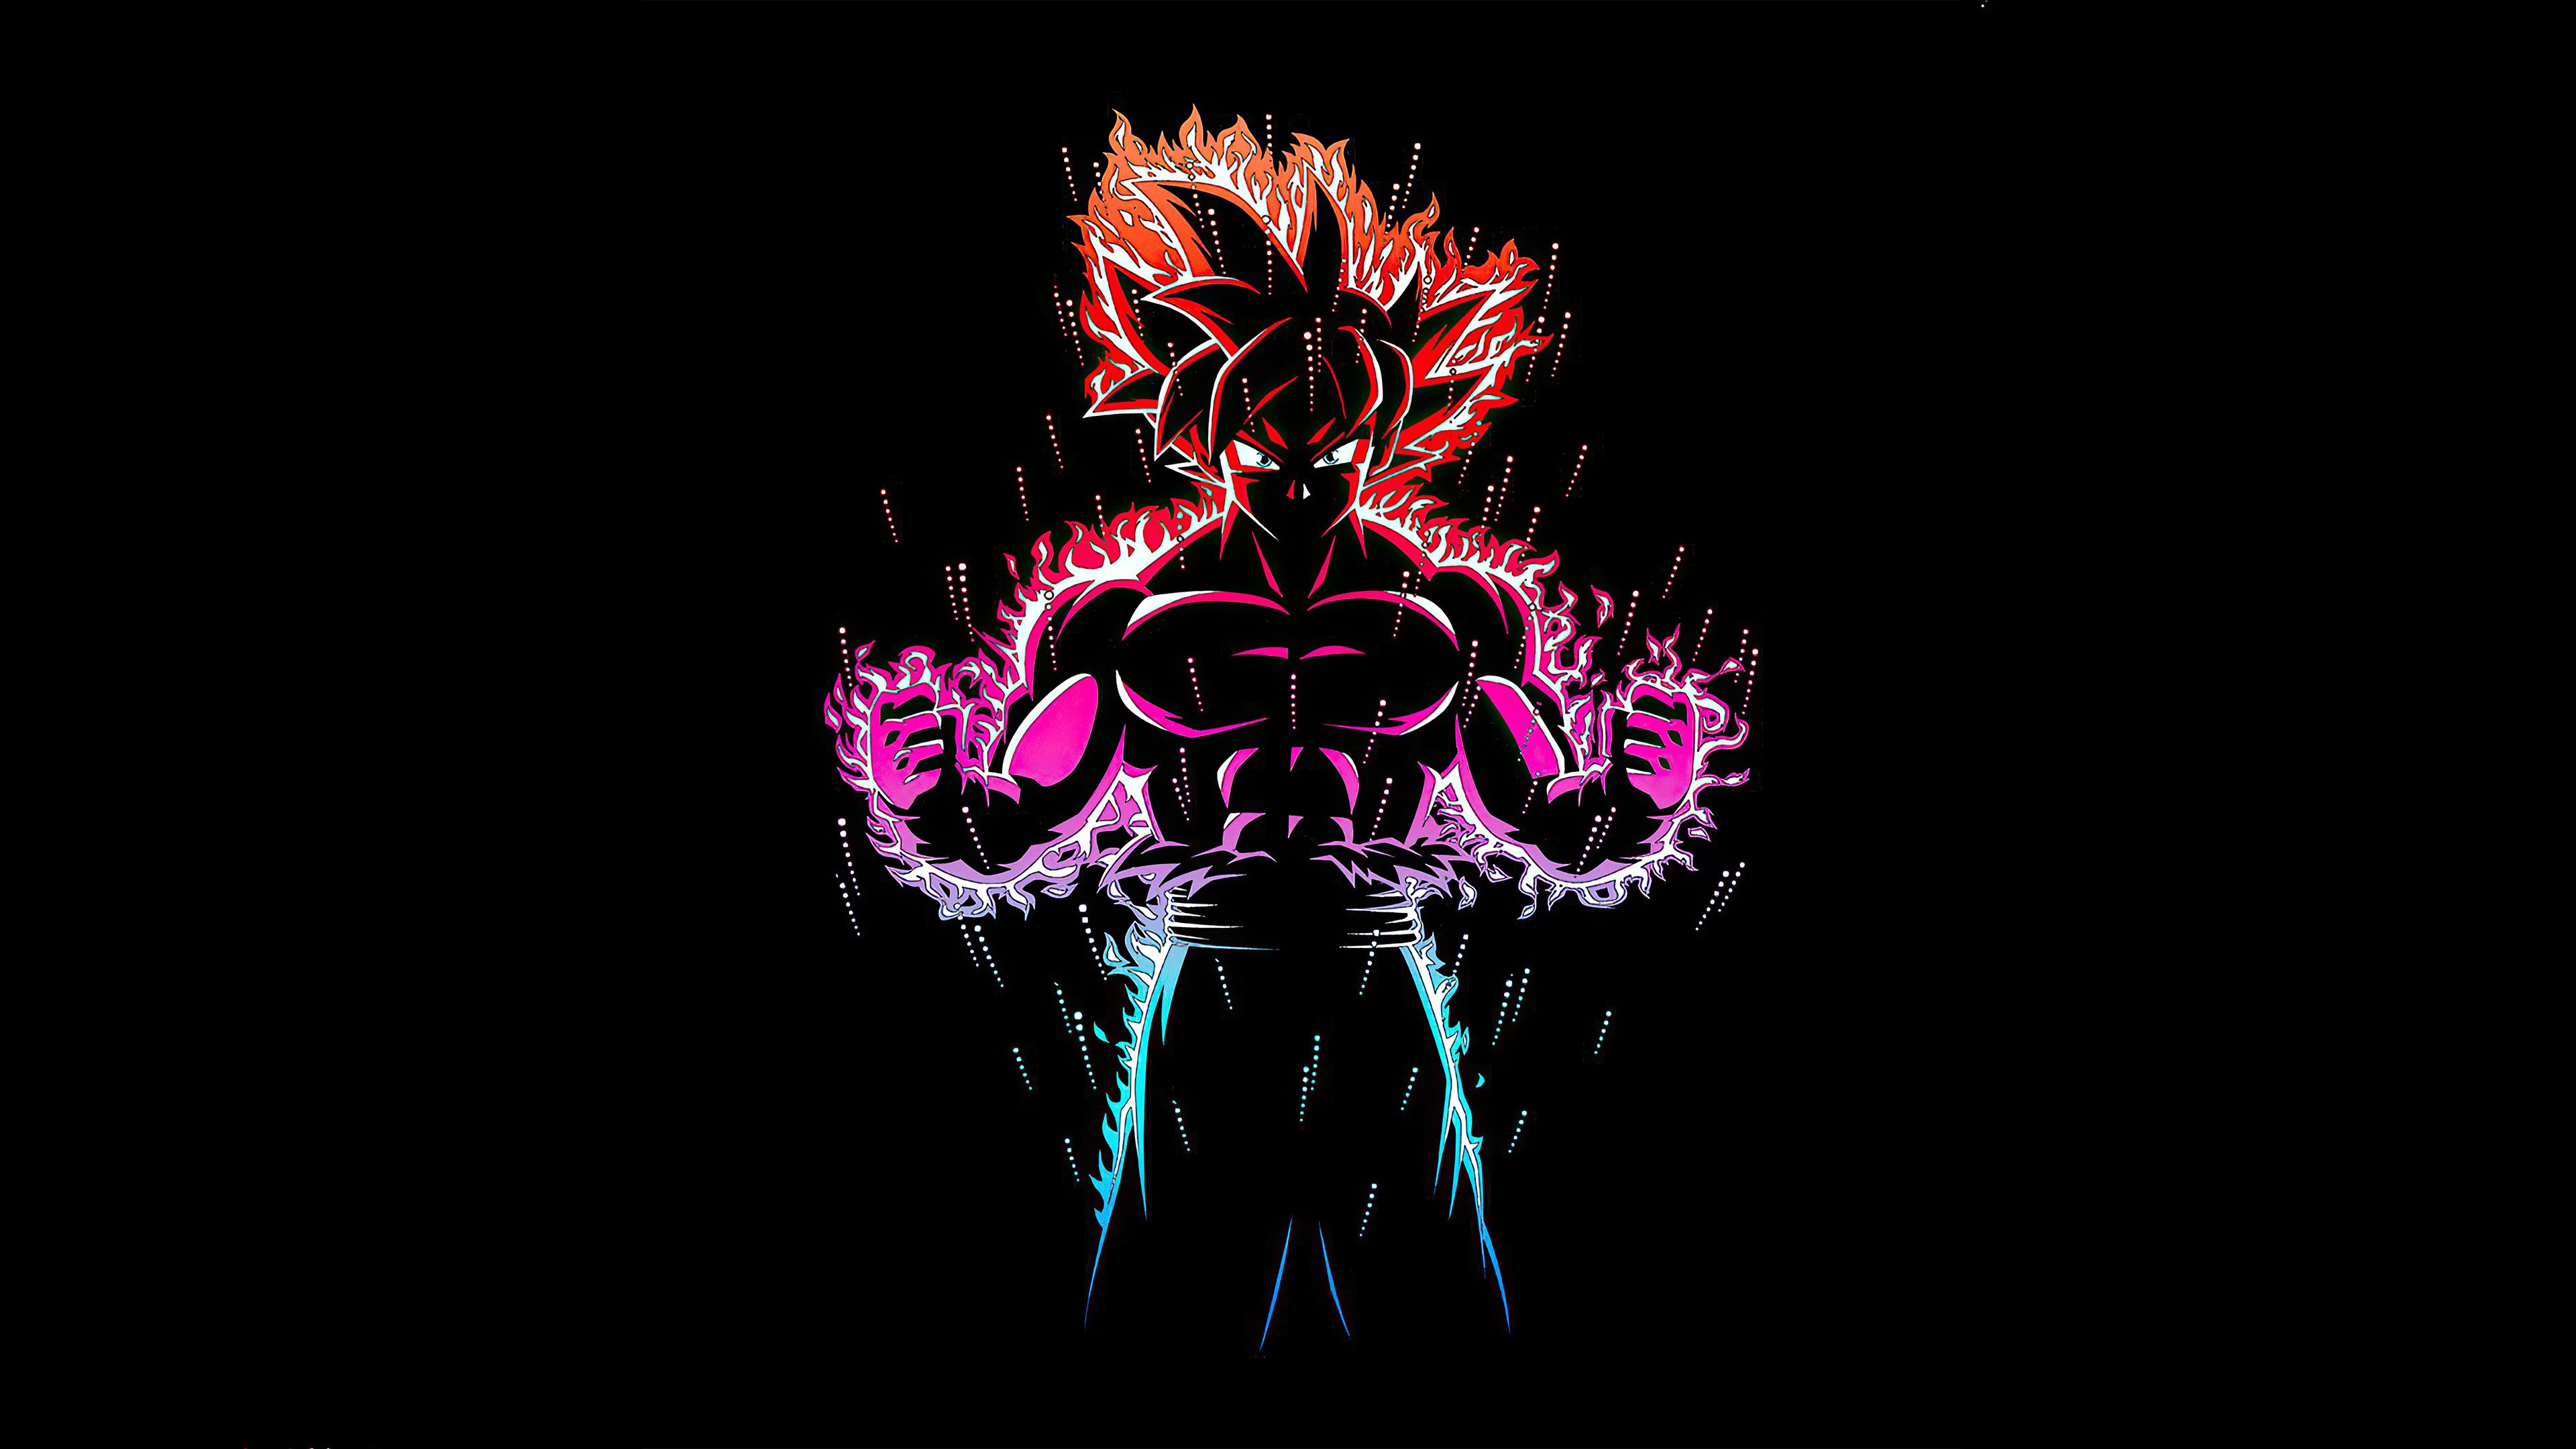 Dragon Ball Z Goku Ultra Instinct Fire Wallpaper, HD Anime ...